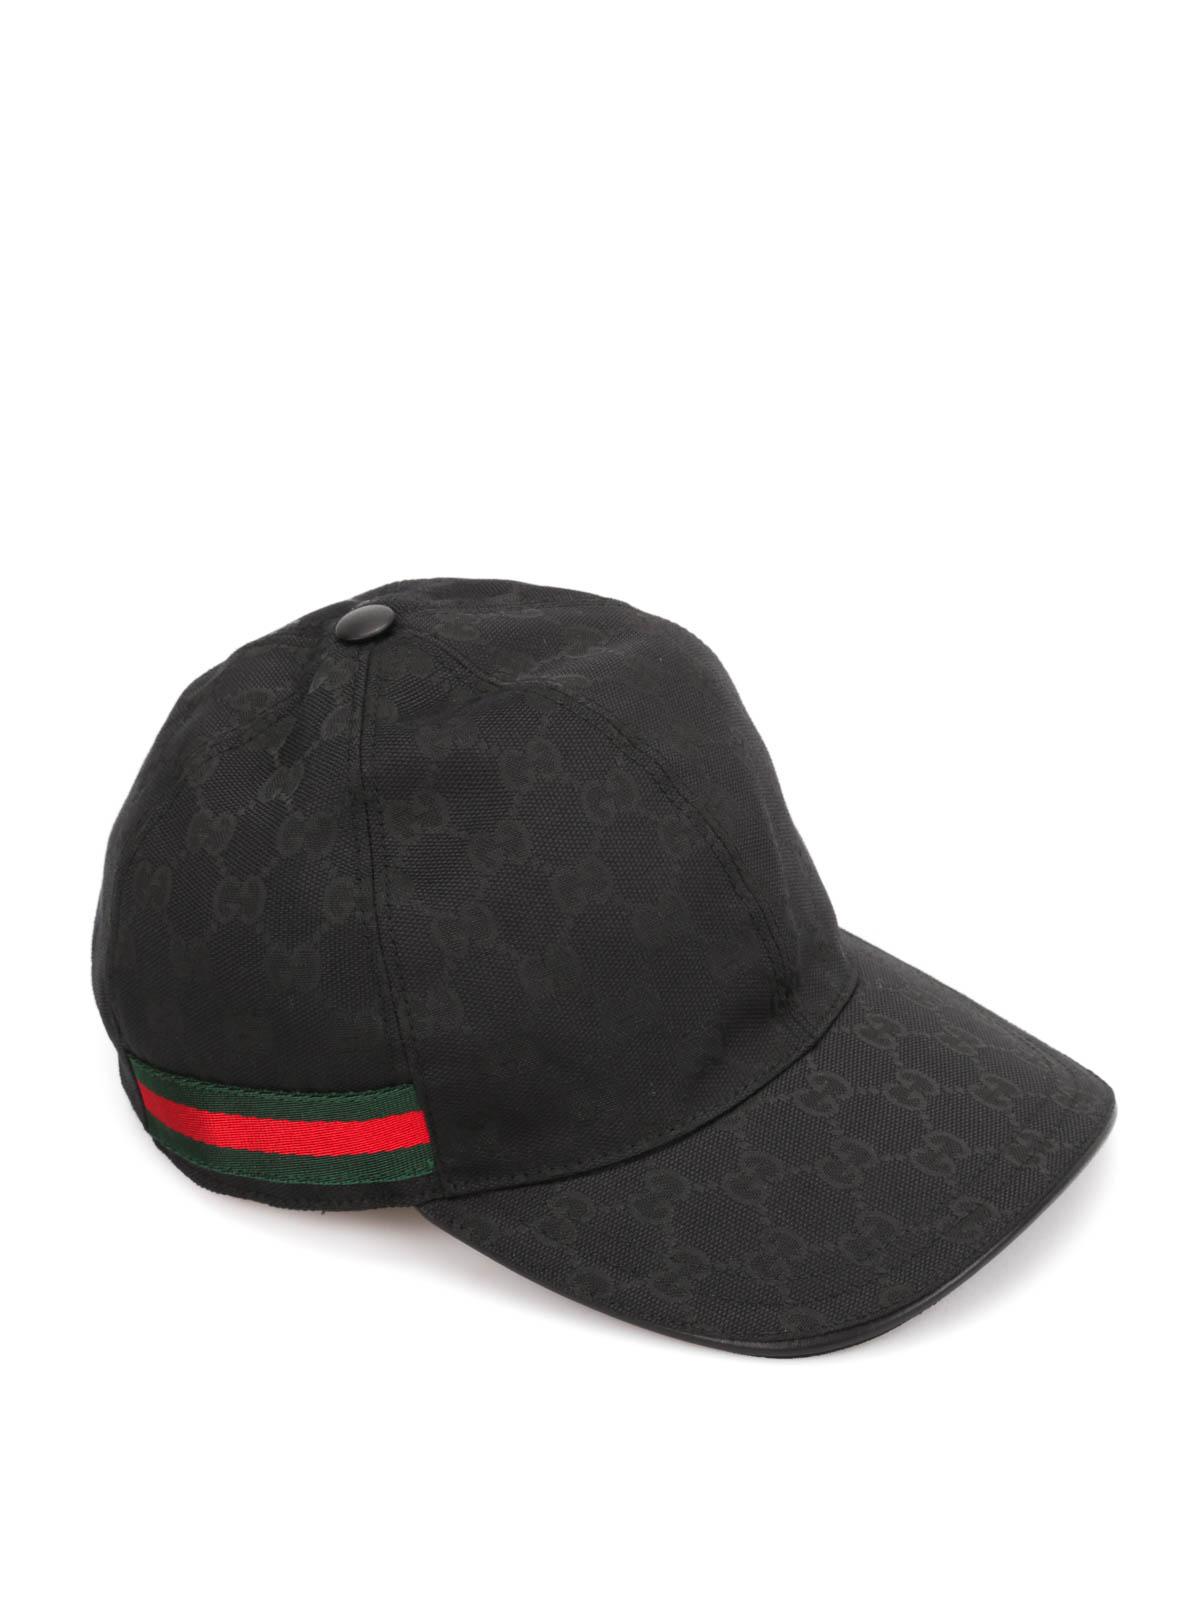 Gucci Gg Canvas Baseball Hat Hats Amp Caps 200035 Ffkpg 1060